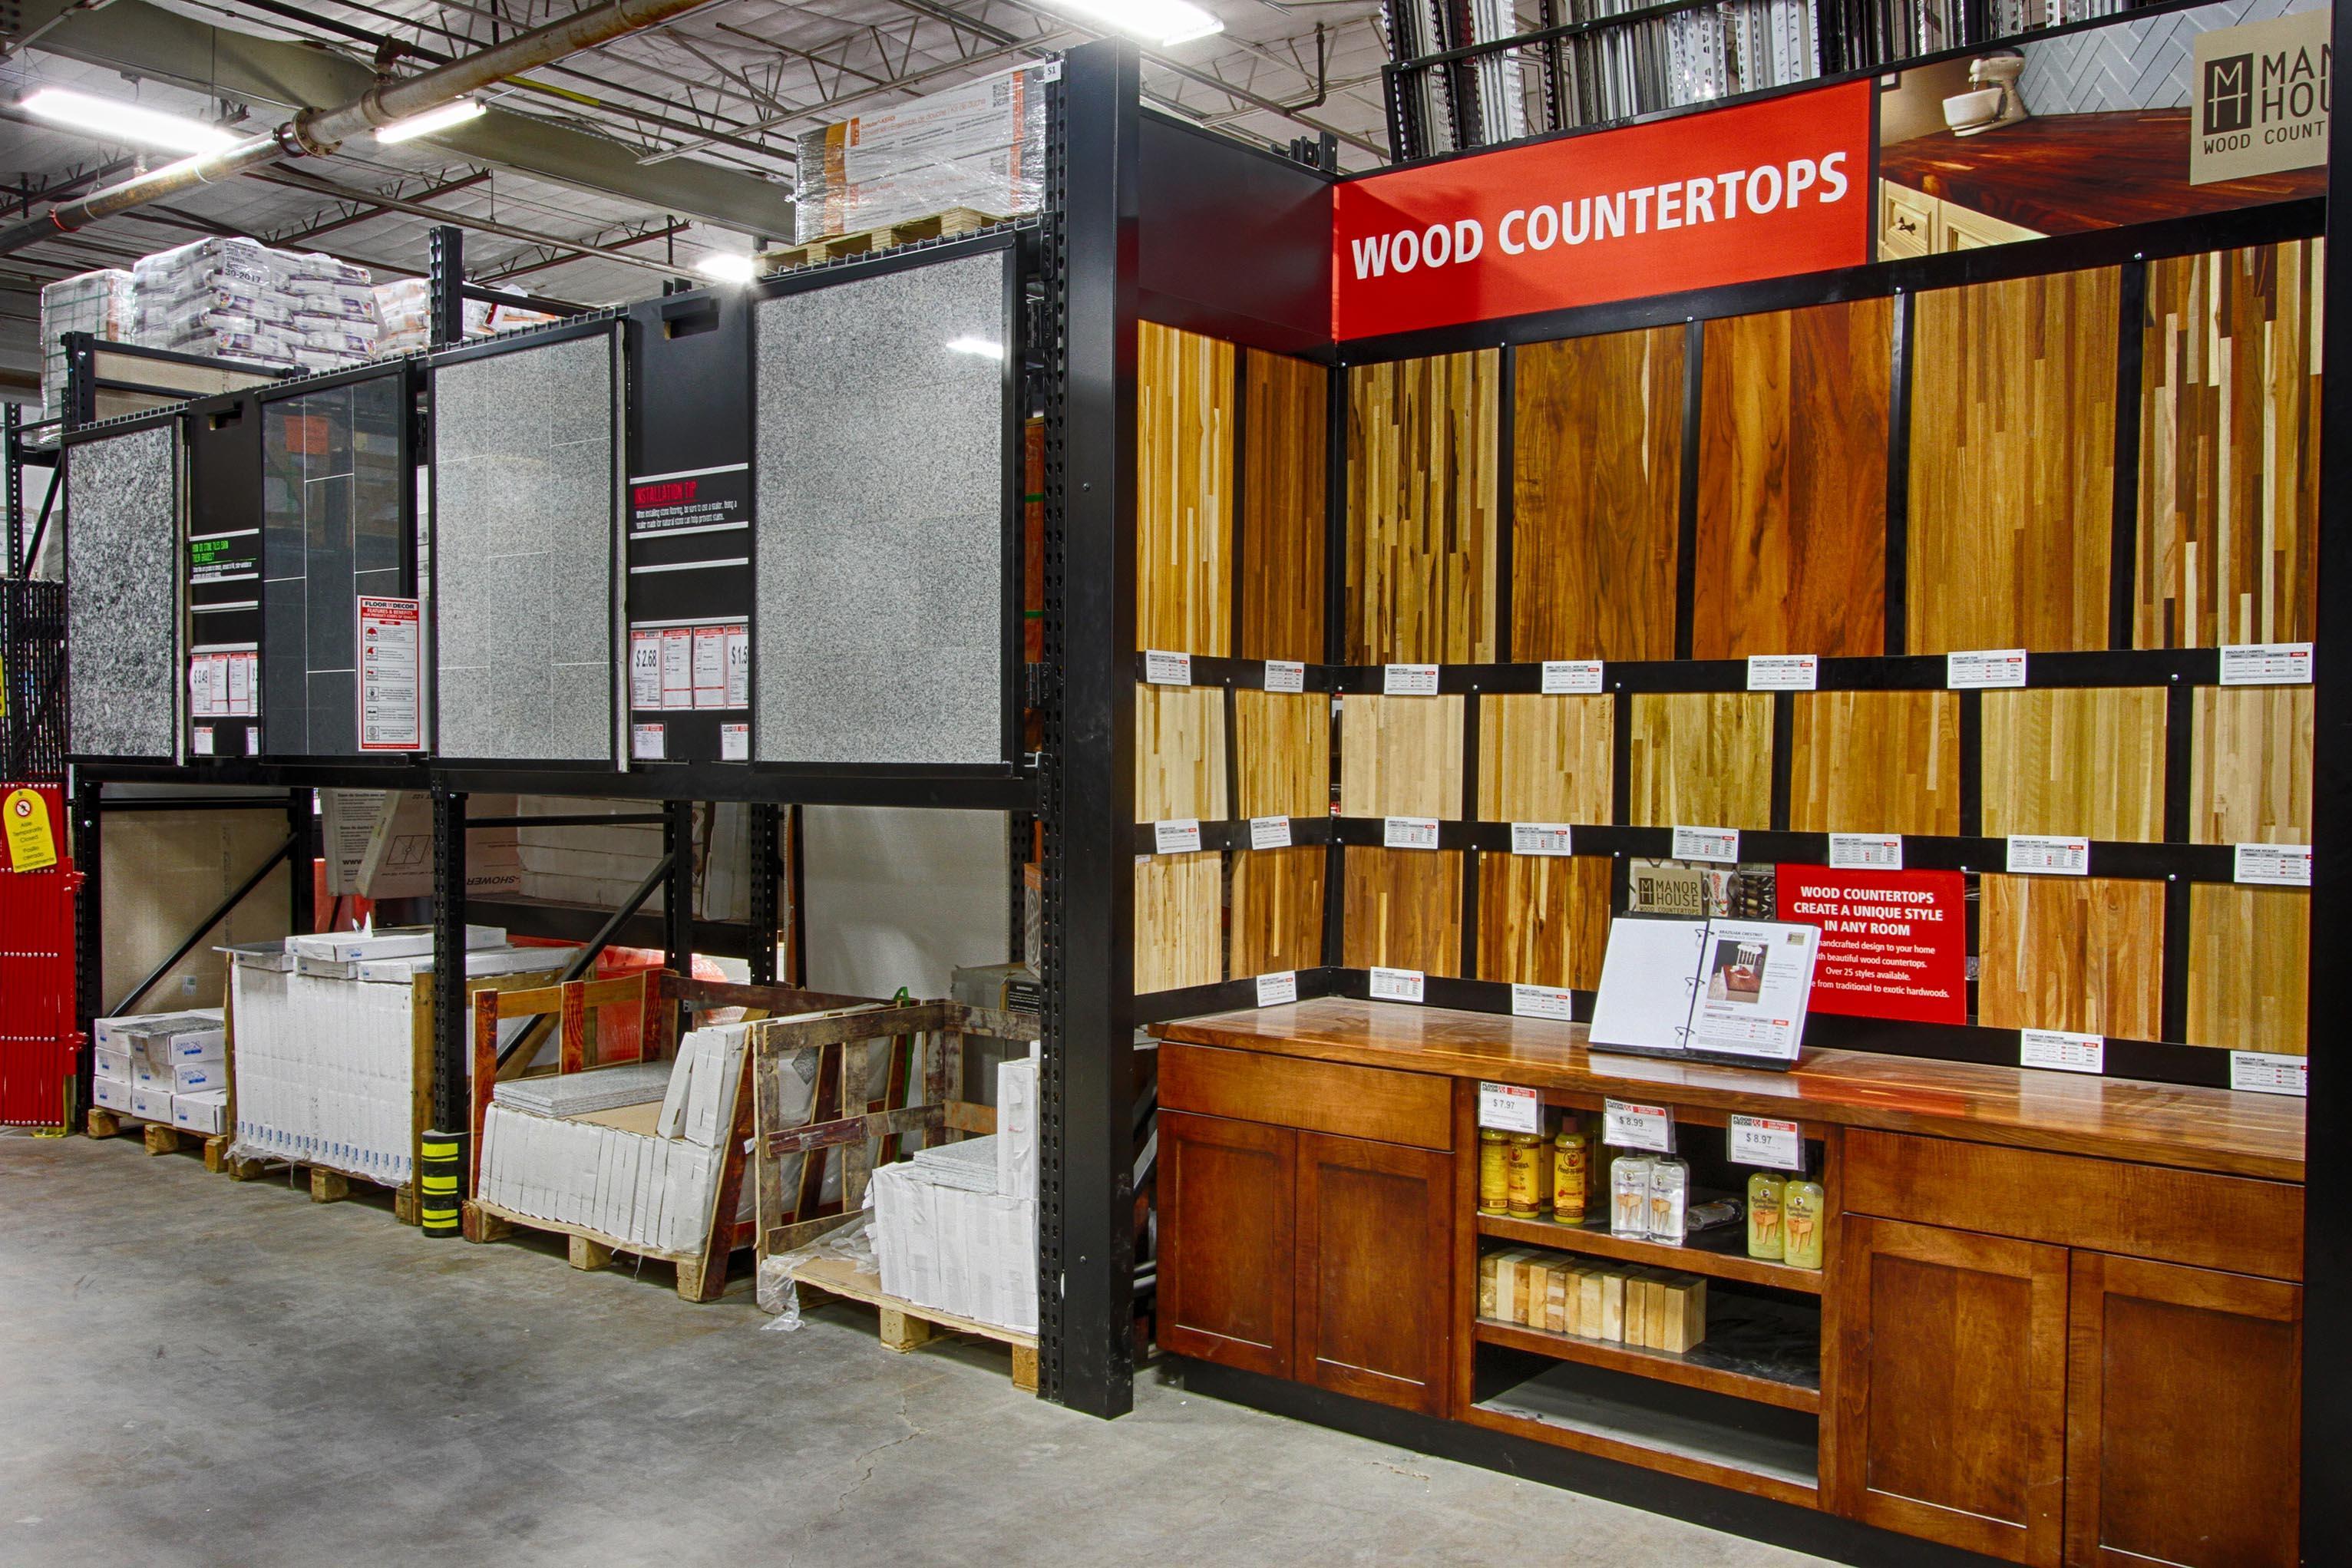 Floor Decor 11542 Gulf Fwy Houston Tx Floor Materials Mapquest